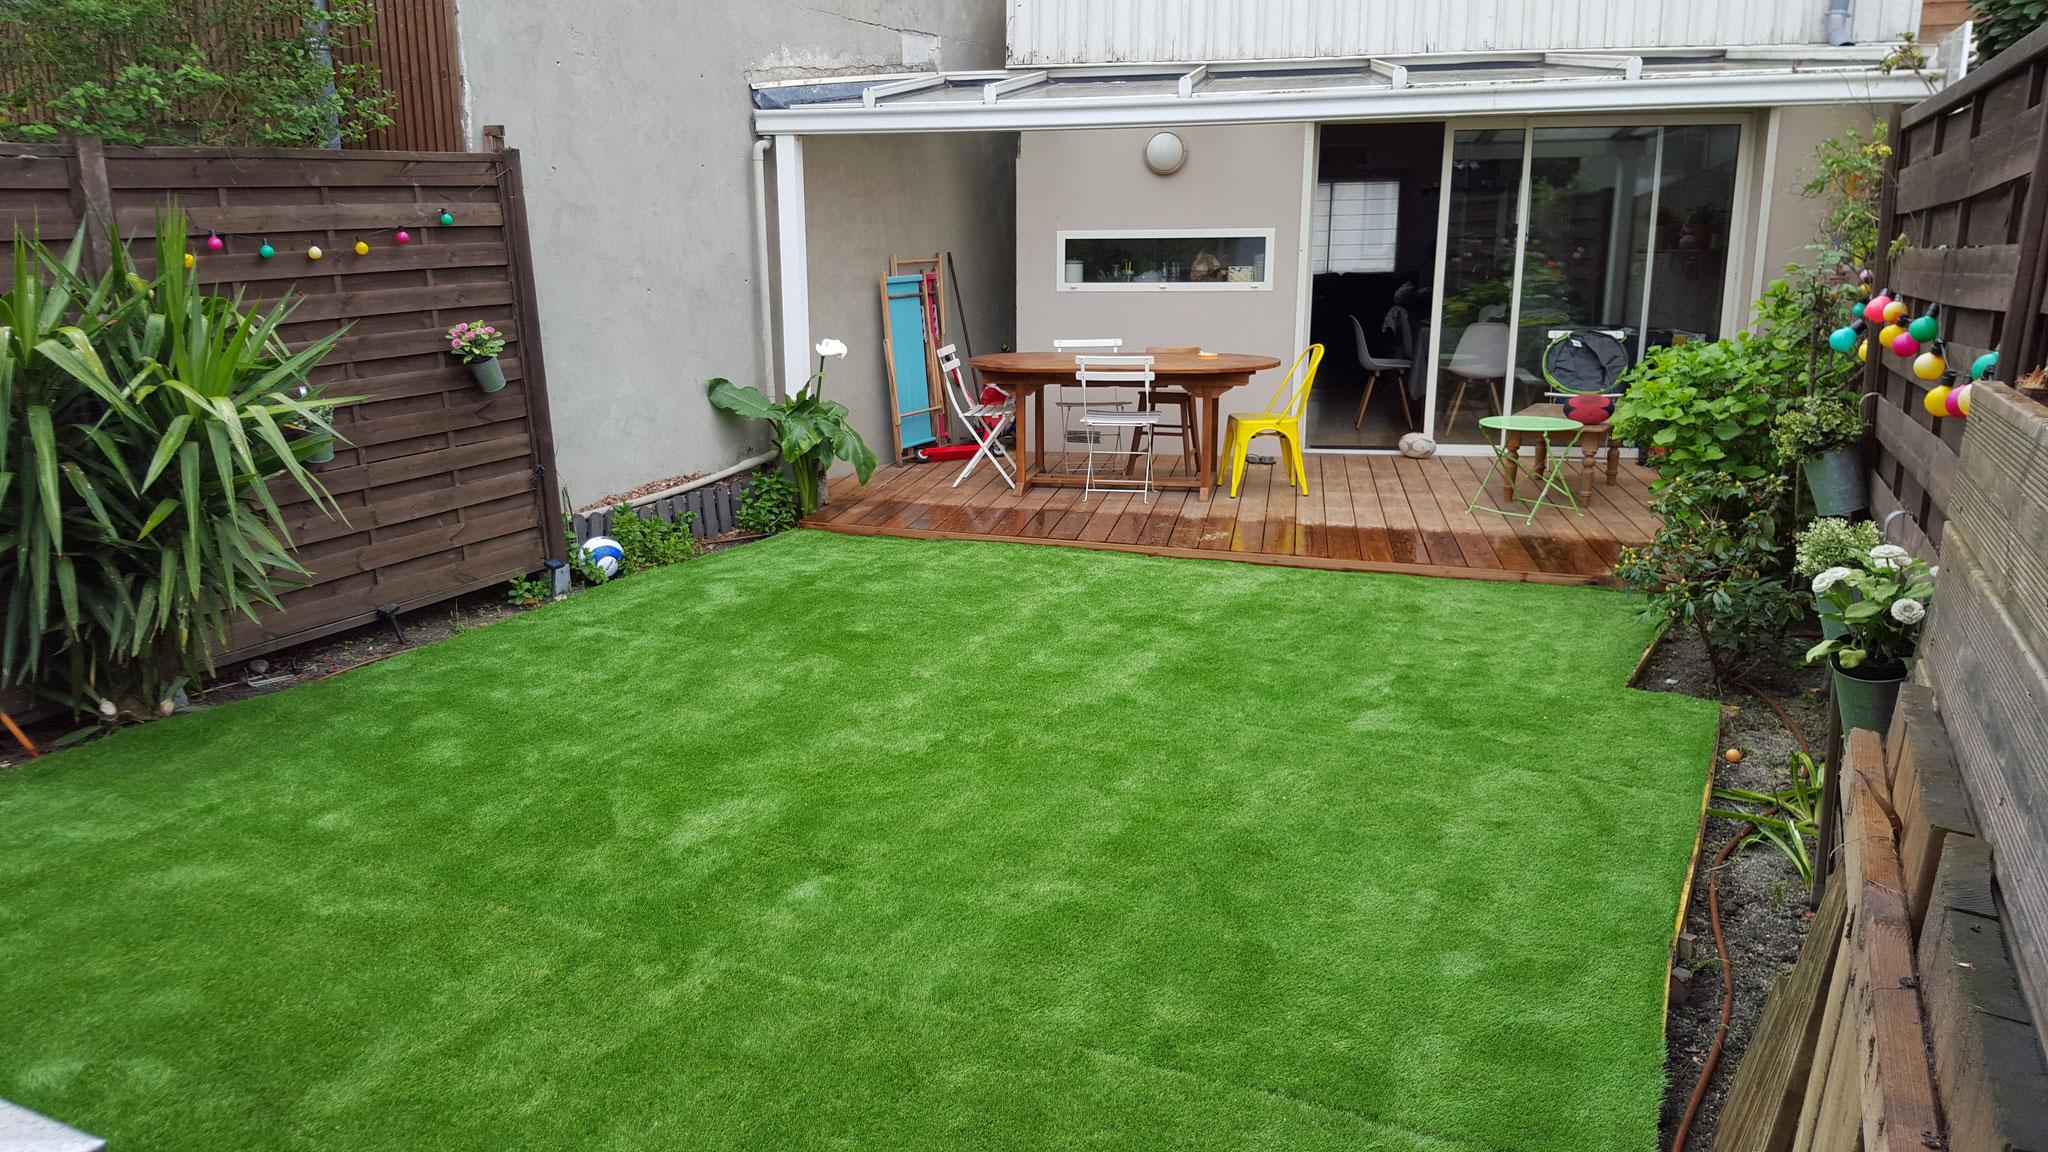 garden staging paysagiste jardin de ville balcon terrasse bordeaux. Black Bedroom Furniture Sets. Home Design Ideas